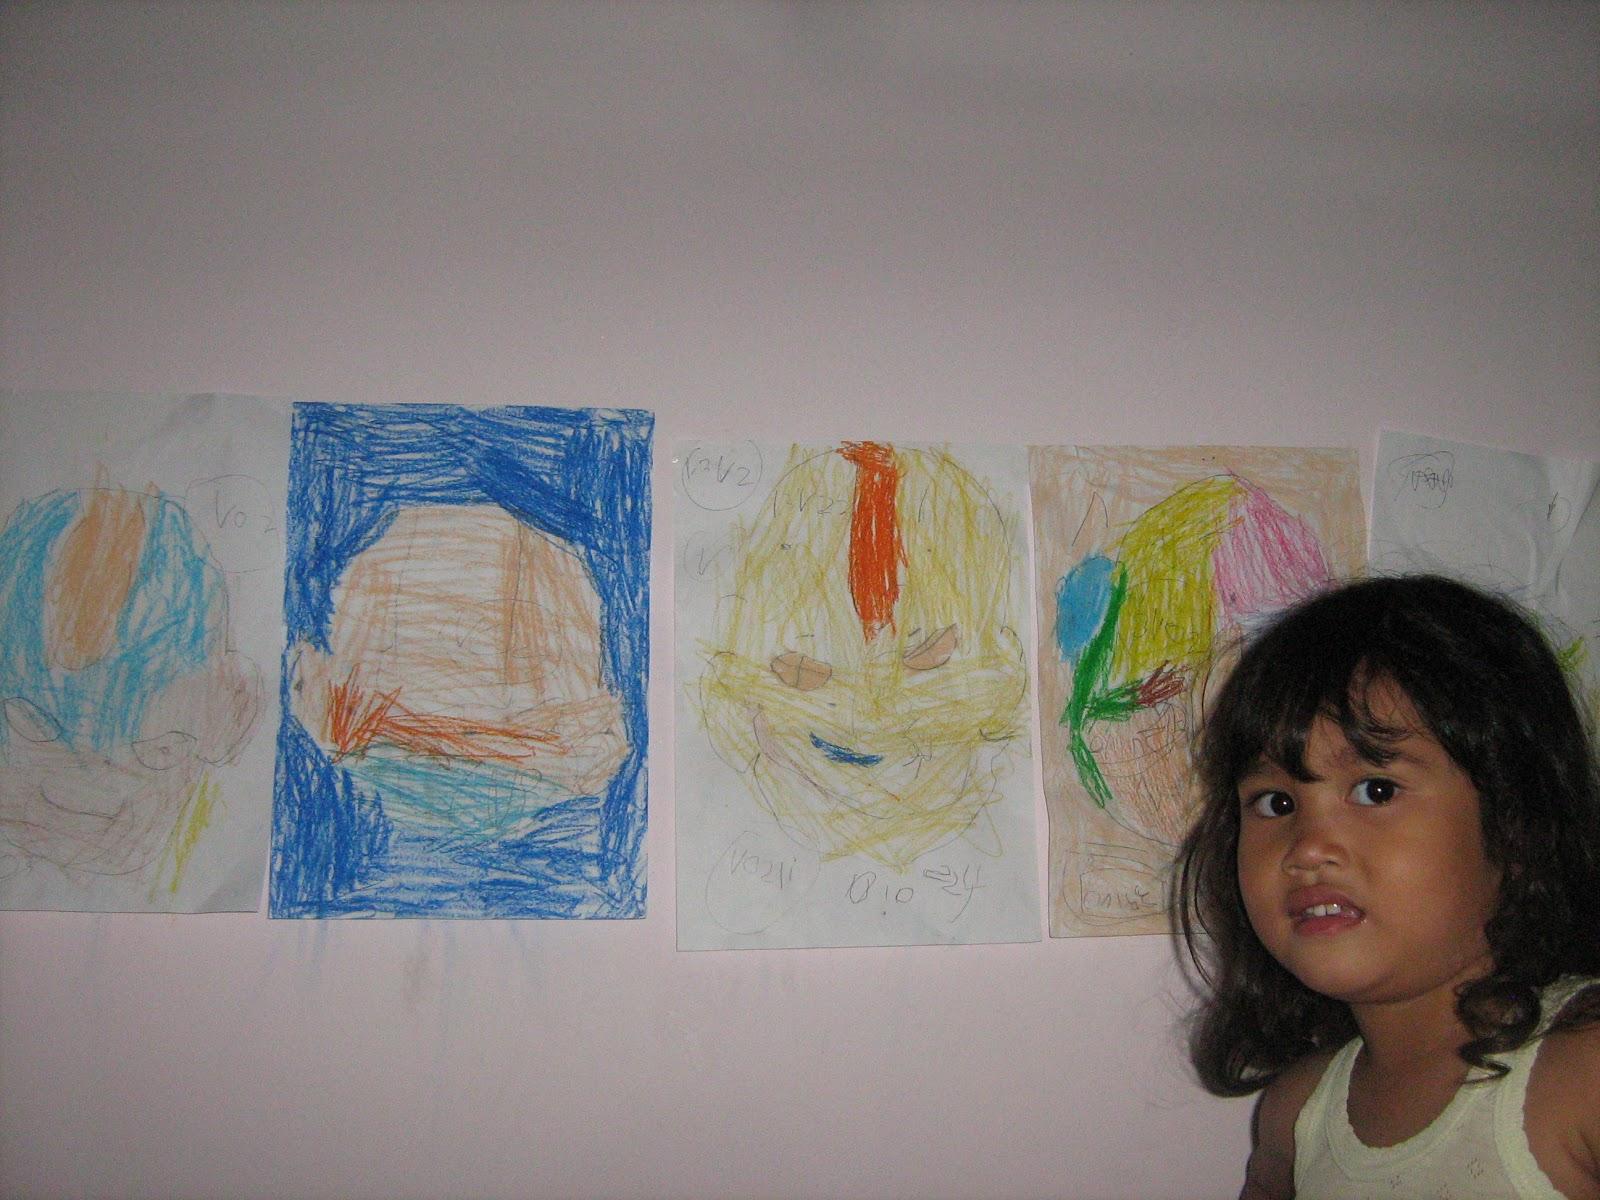 Ibu Indonesia: Tanggal Berapa Ma?